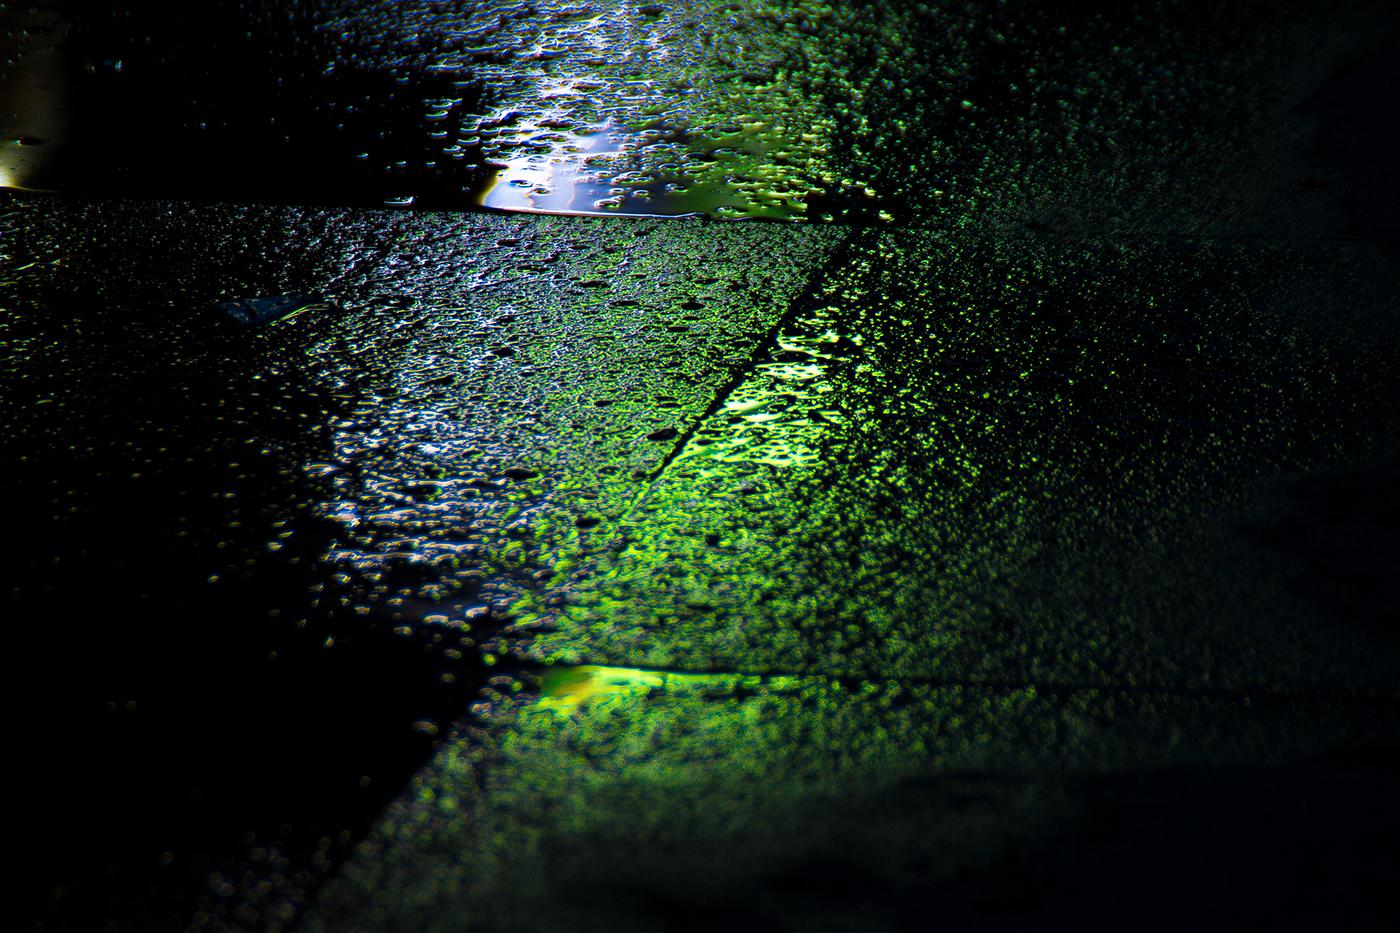 wet-neon-local-preacher-photography-7.jpg